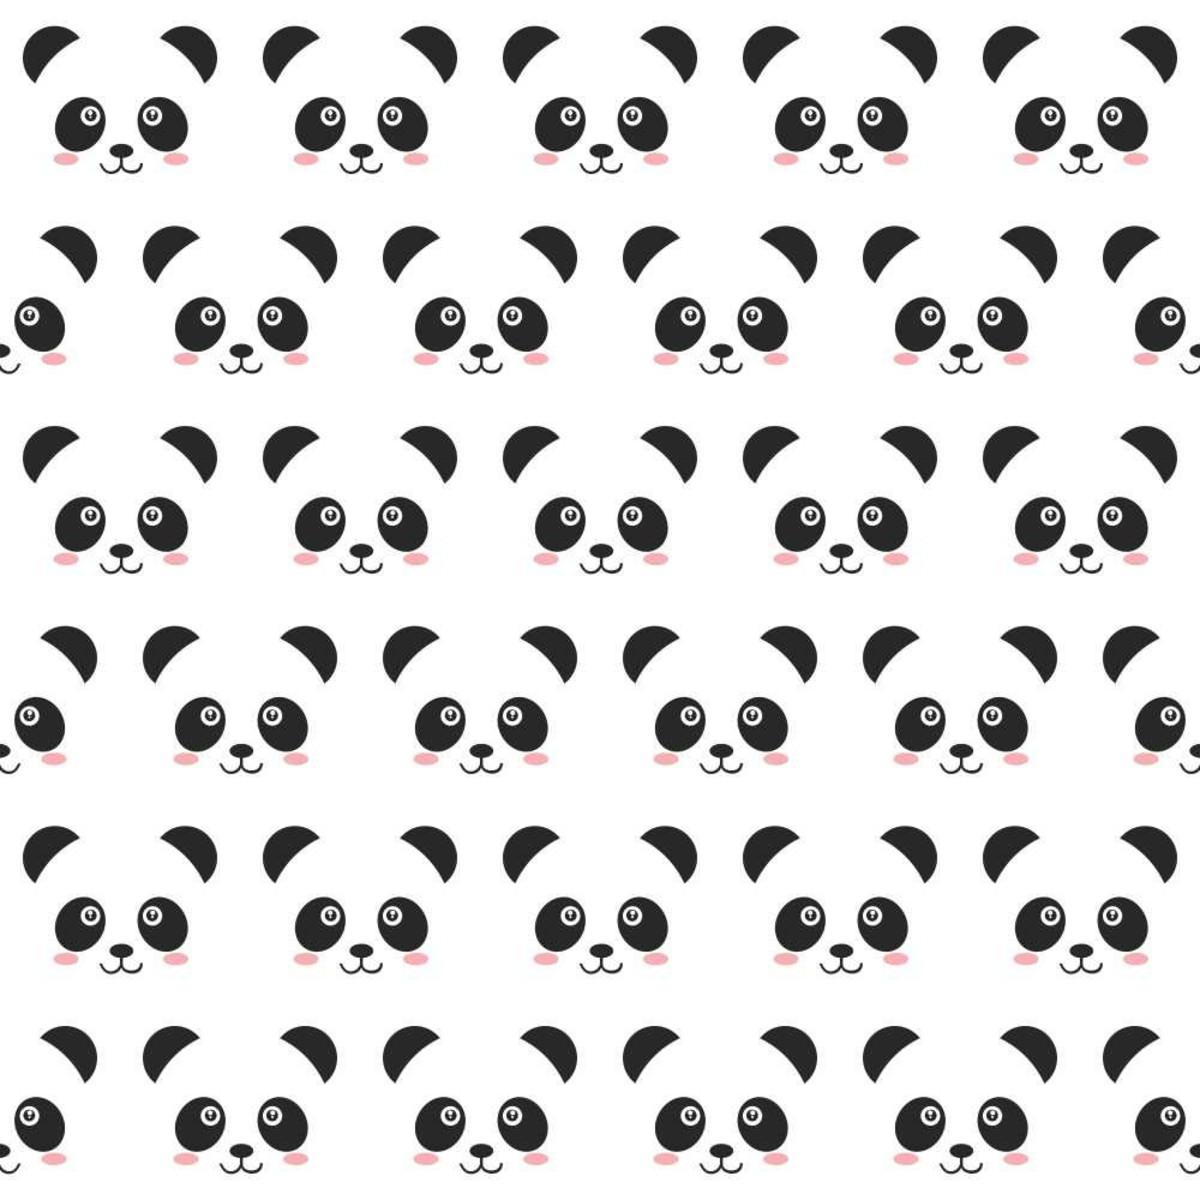 3c3676aaf2 Zoom · Papel de Parede Panda (60cm x 2